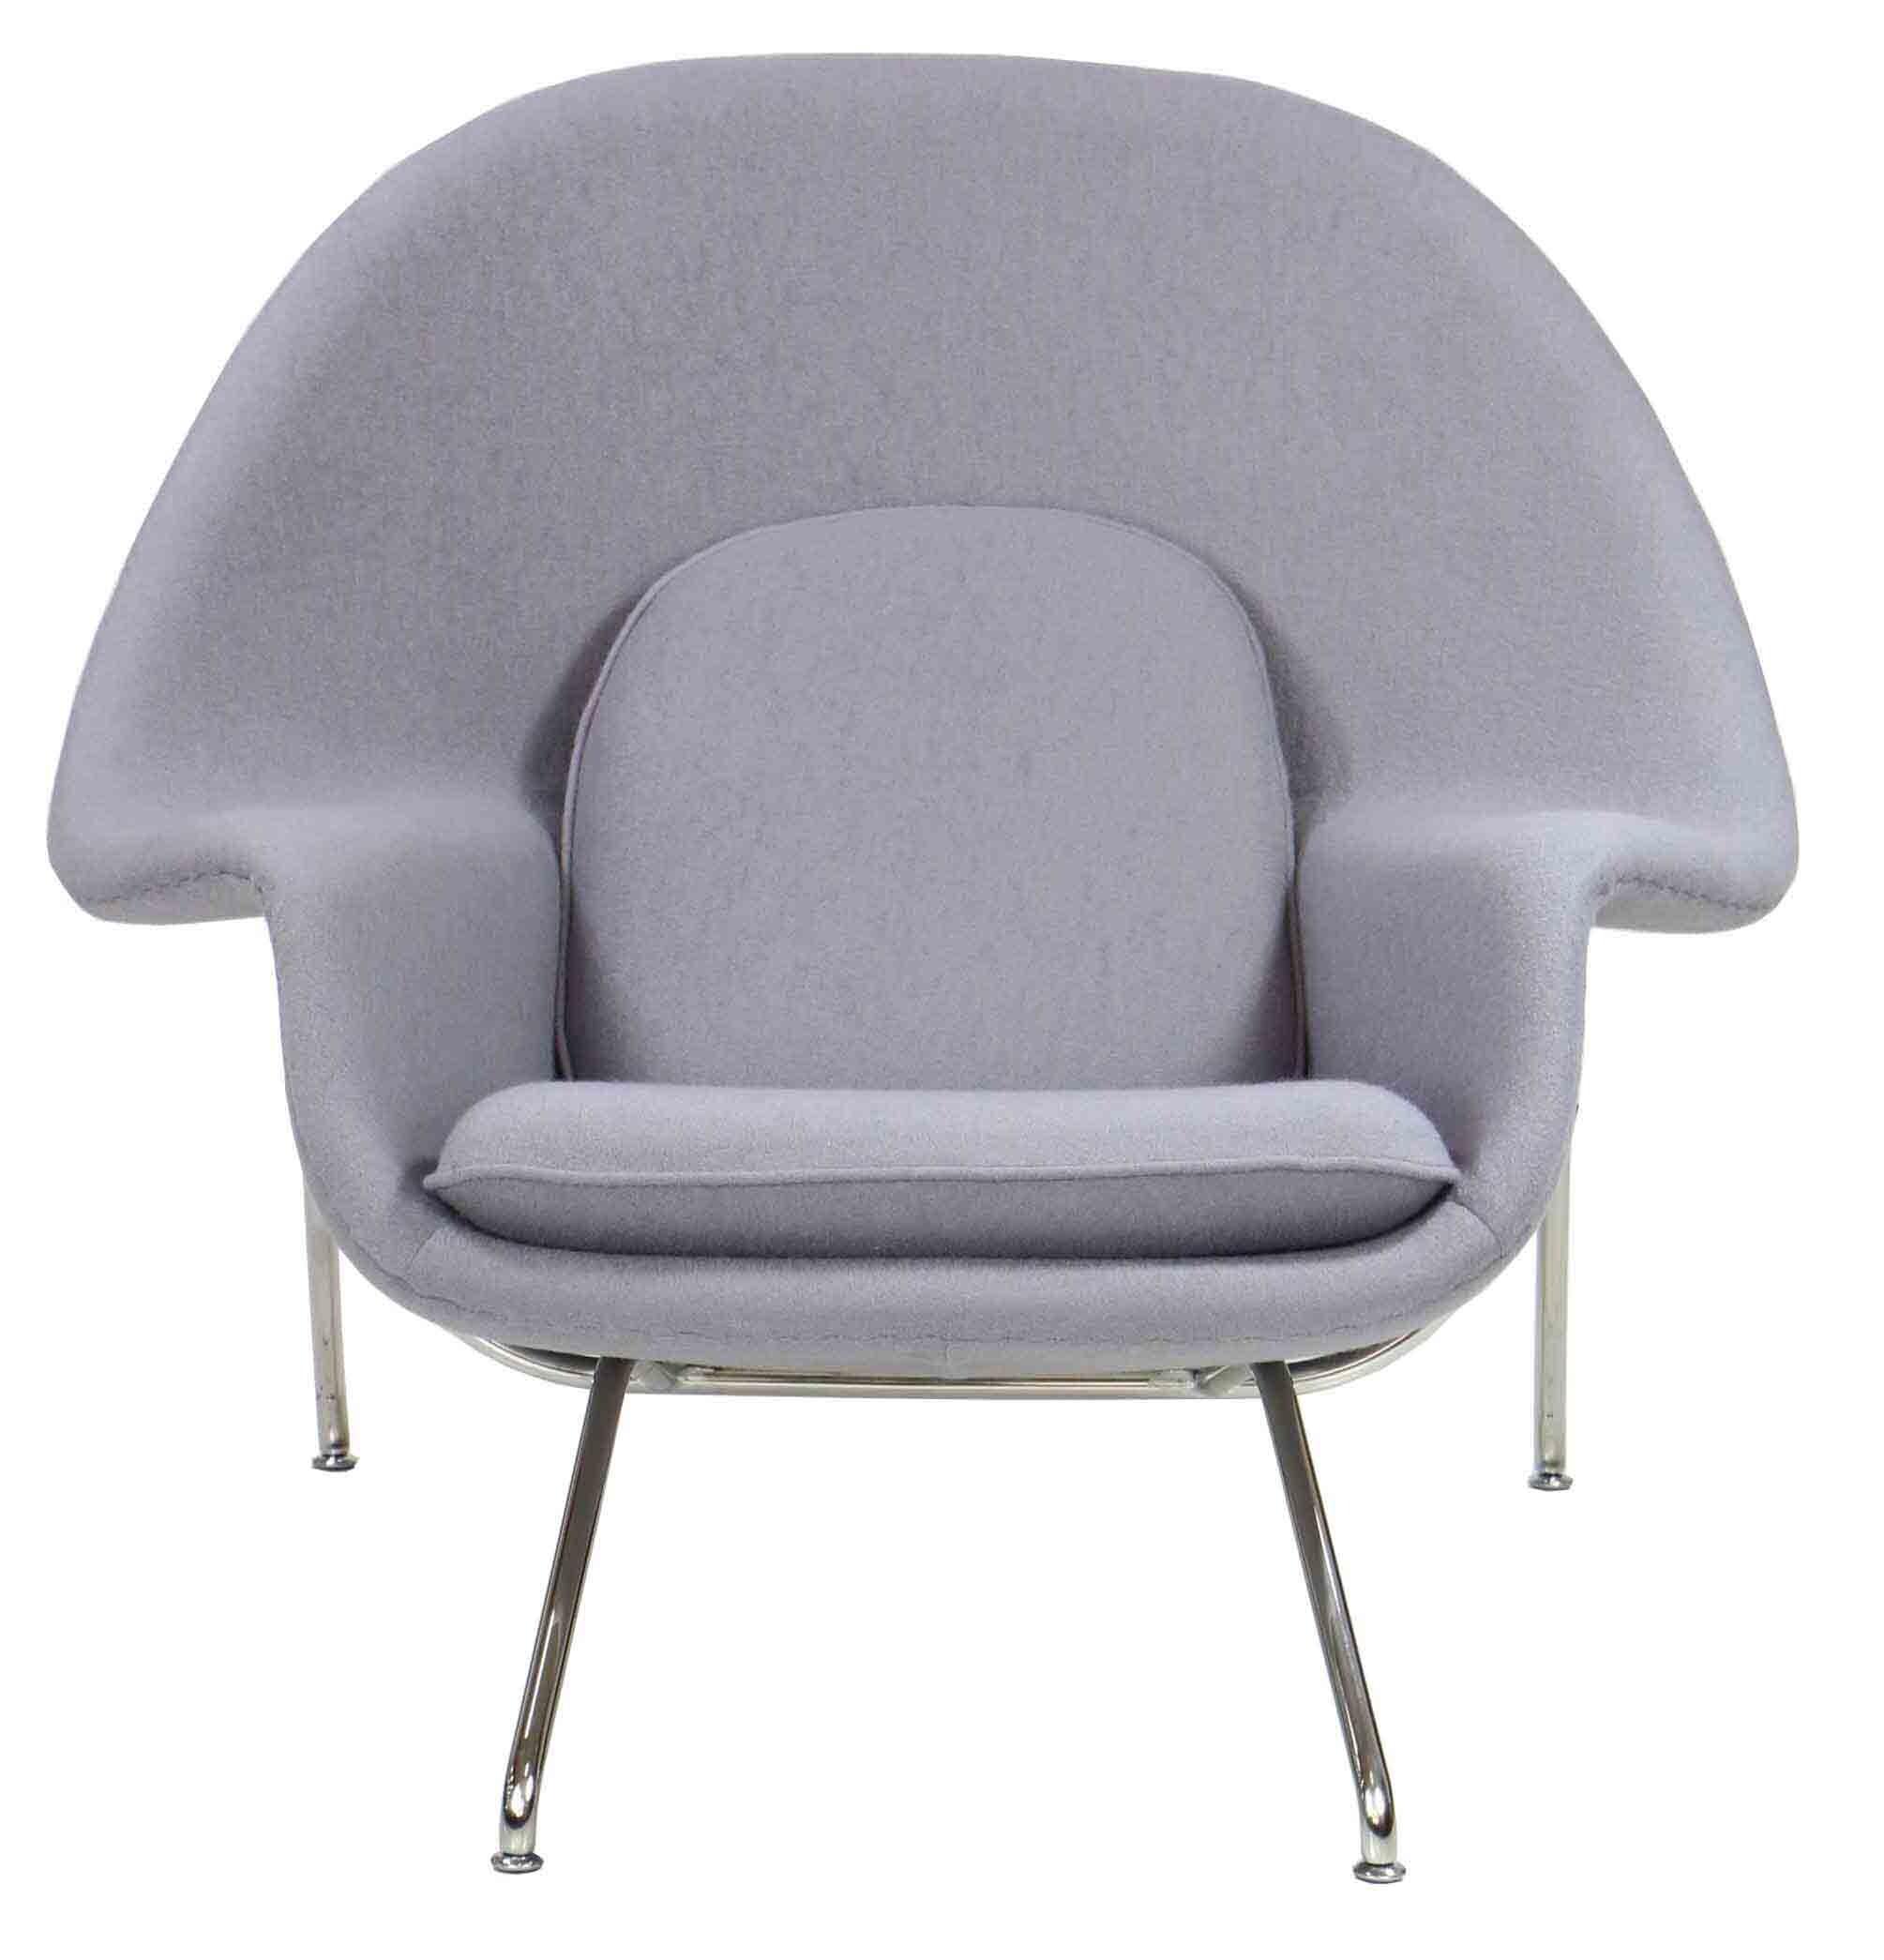 Designer Replica Womb Chair In Light Grey